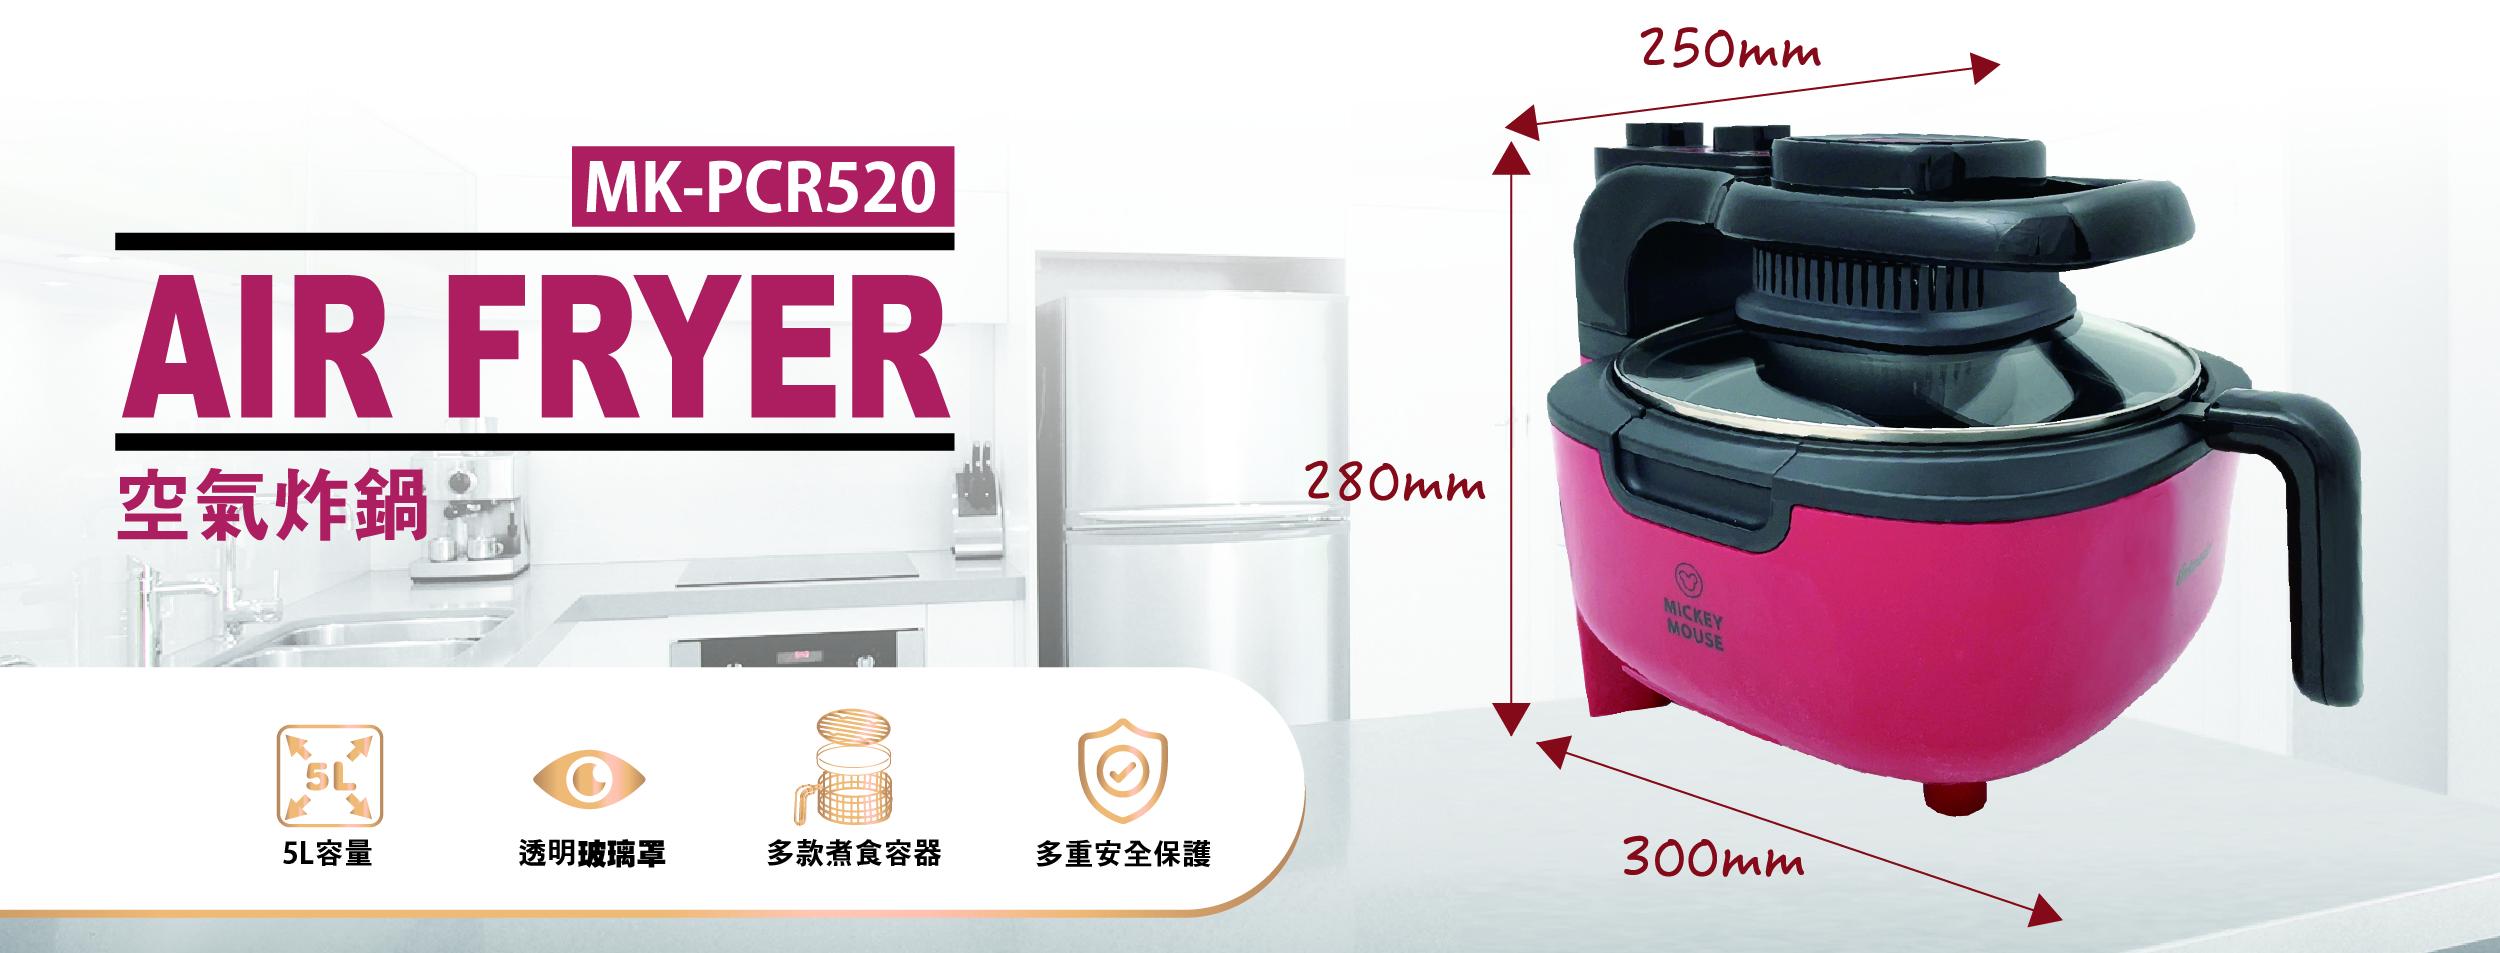 PCR520_TOP2-01